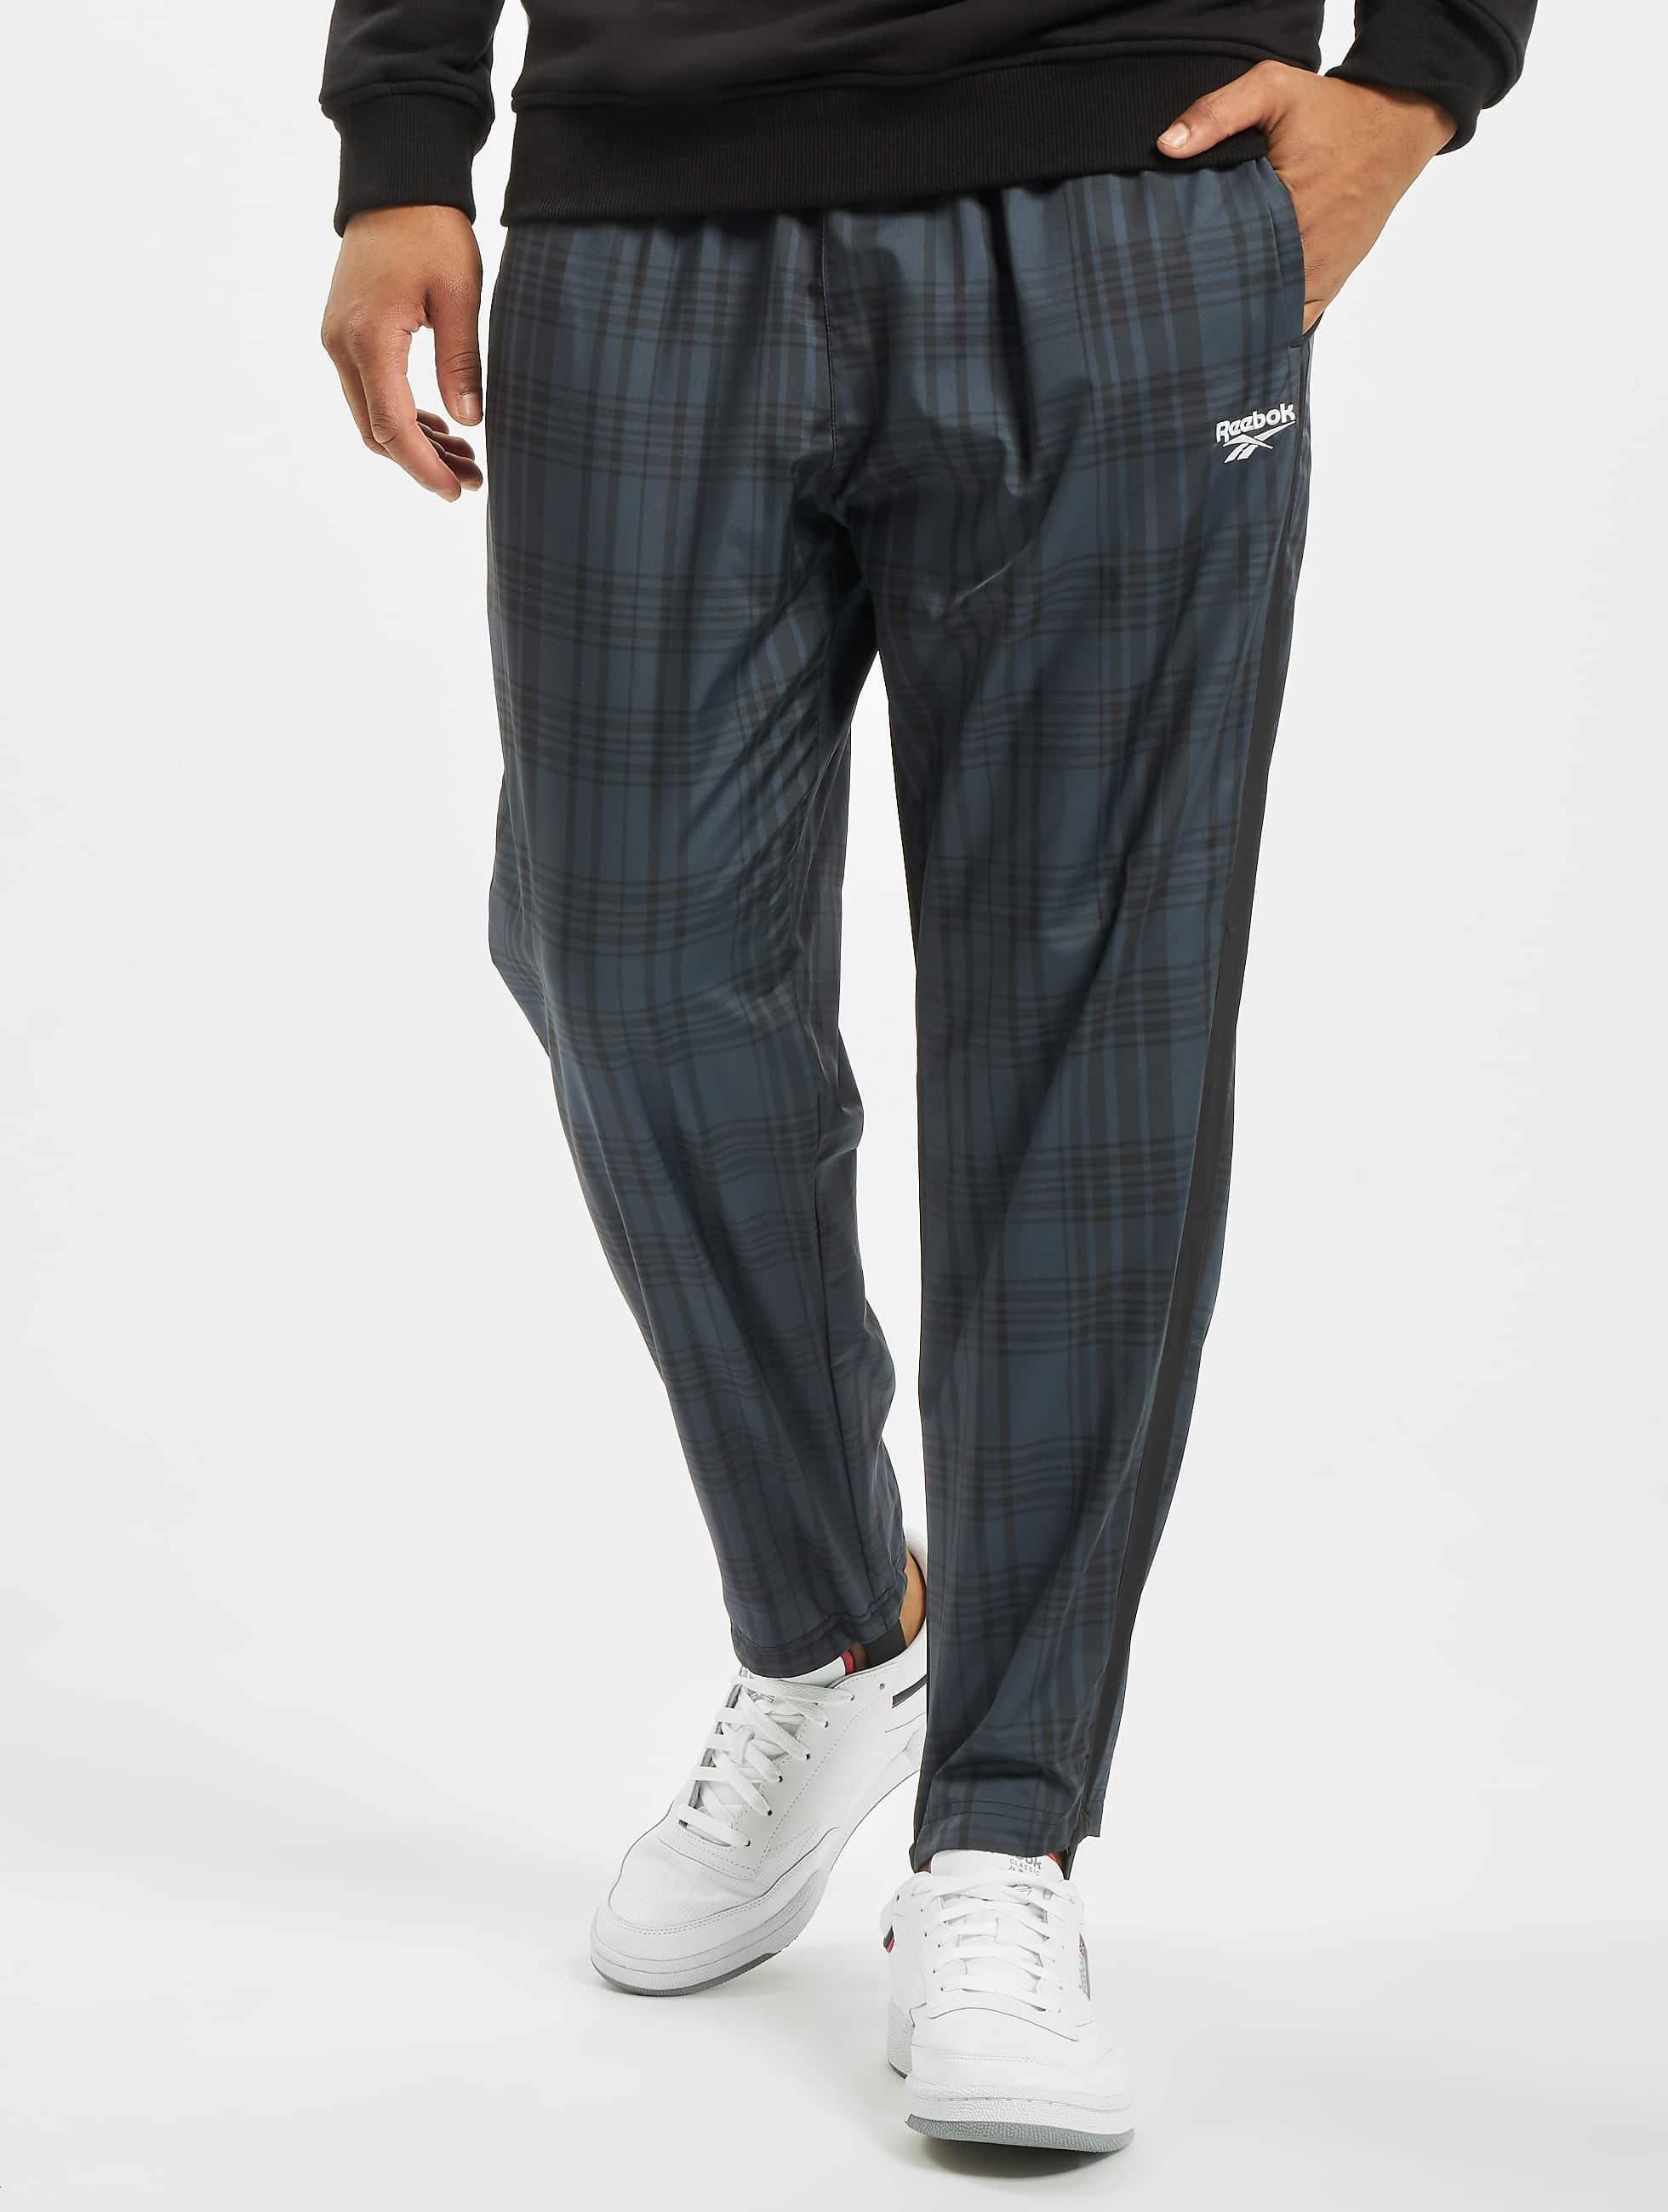 diversifiziert in der Verpackung Exklusive Angebote Preis Reebok Classics Vector Plaid Pants Black